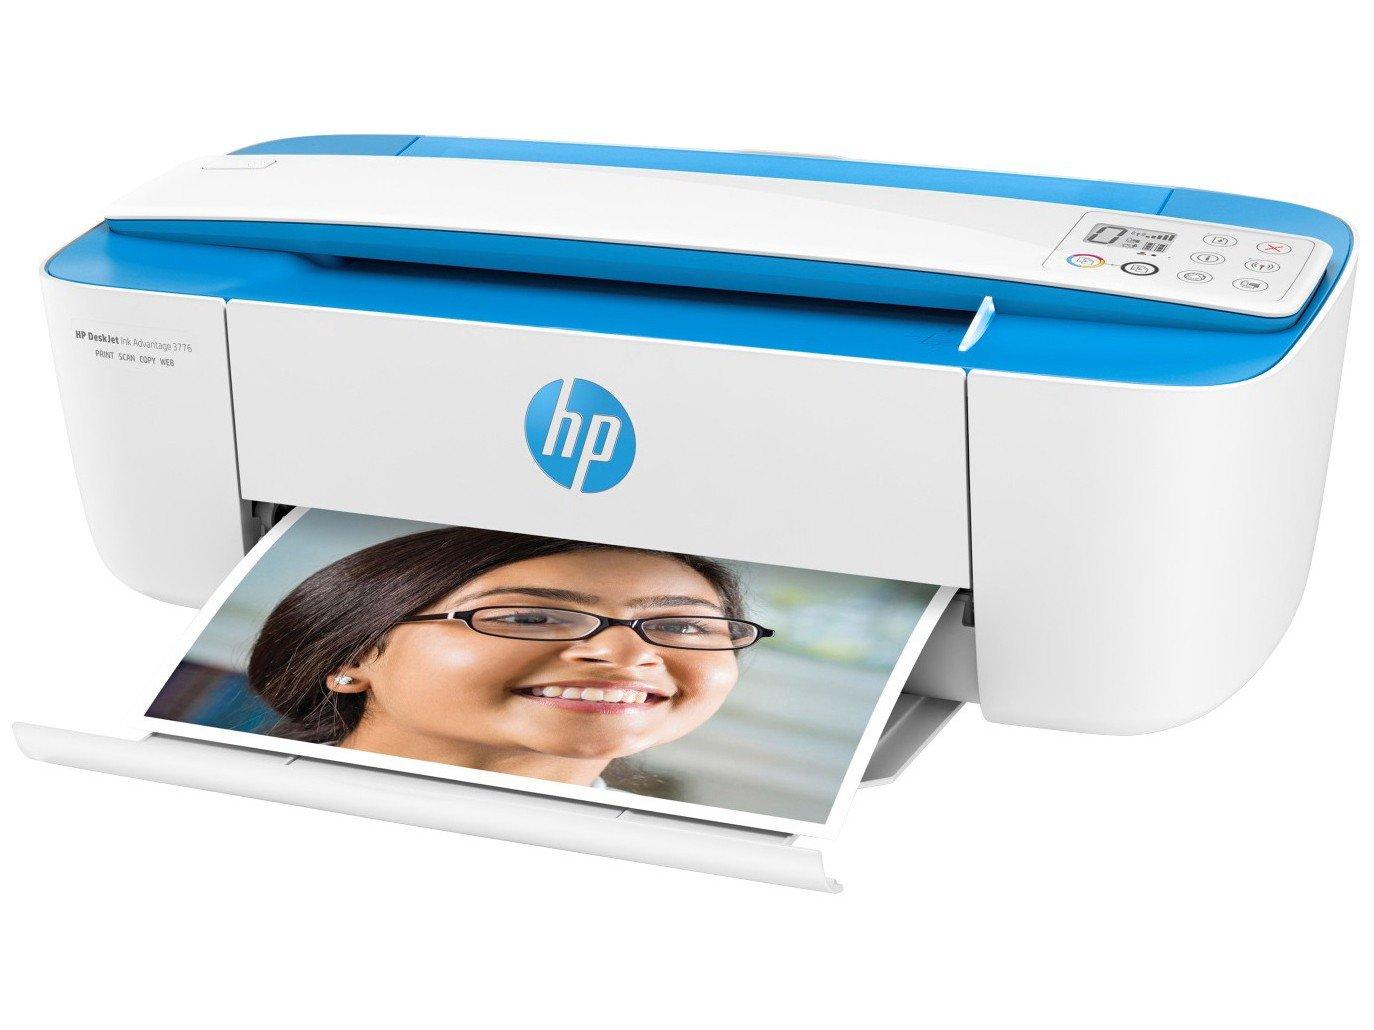 Foto 3 - Impressora Multifuncional HP - DeskJet Ink Advantage 3776 Jato de Tinta Wi-Fi